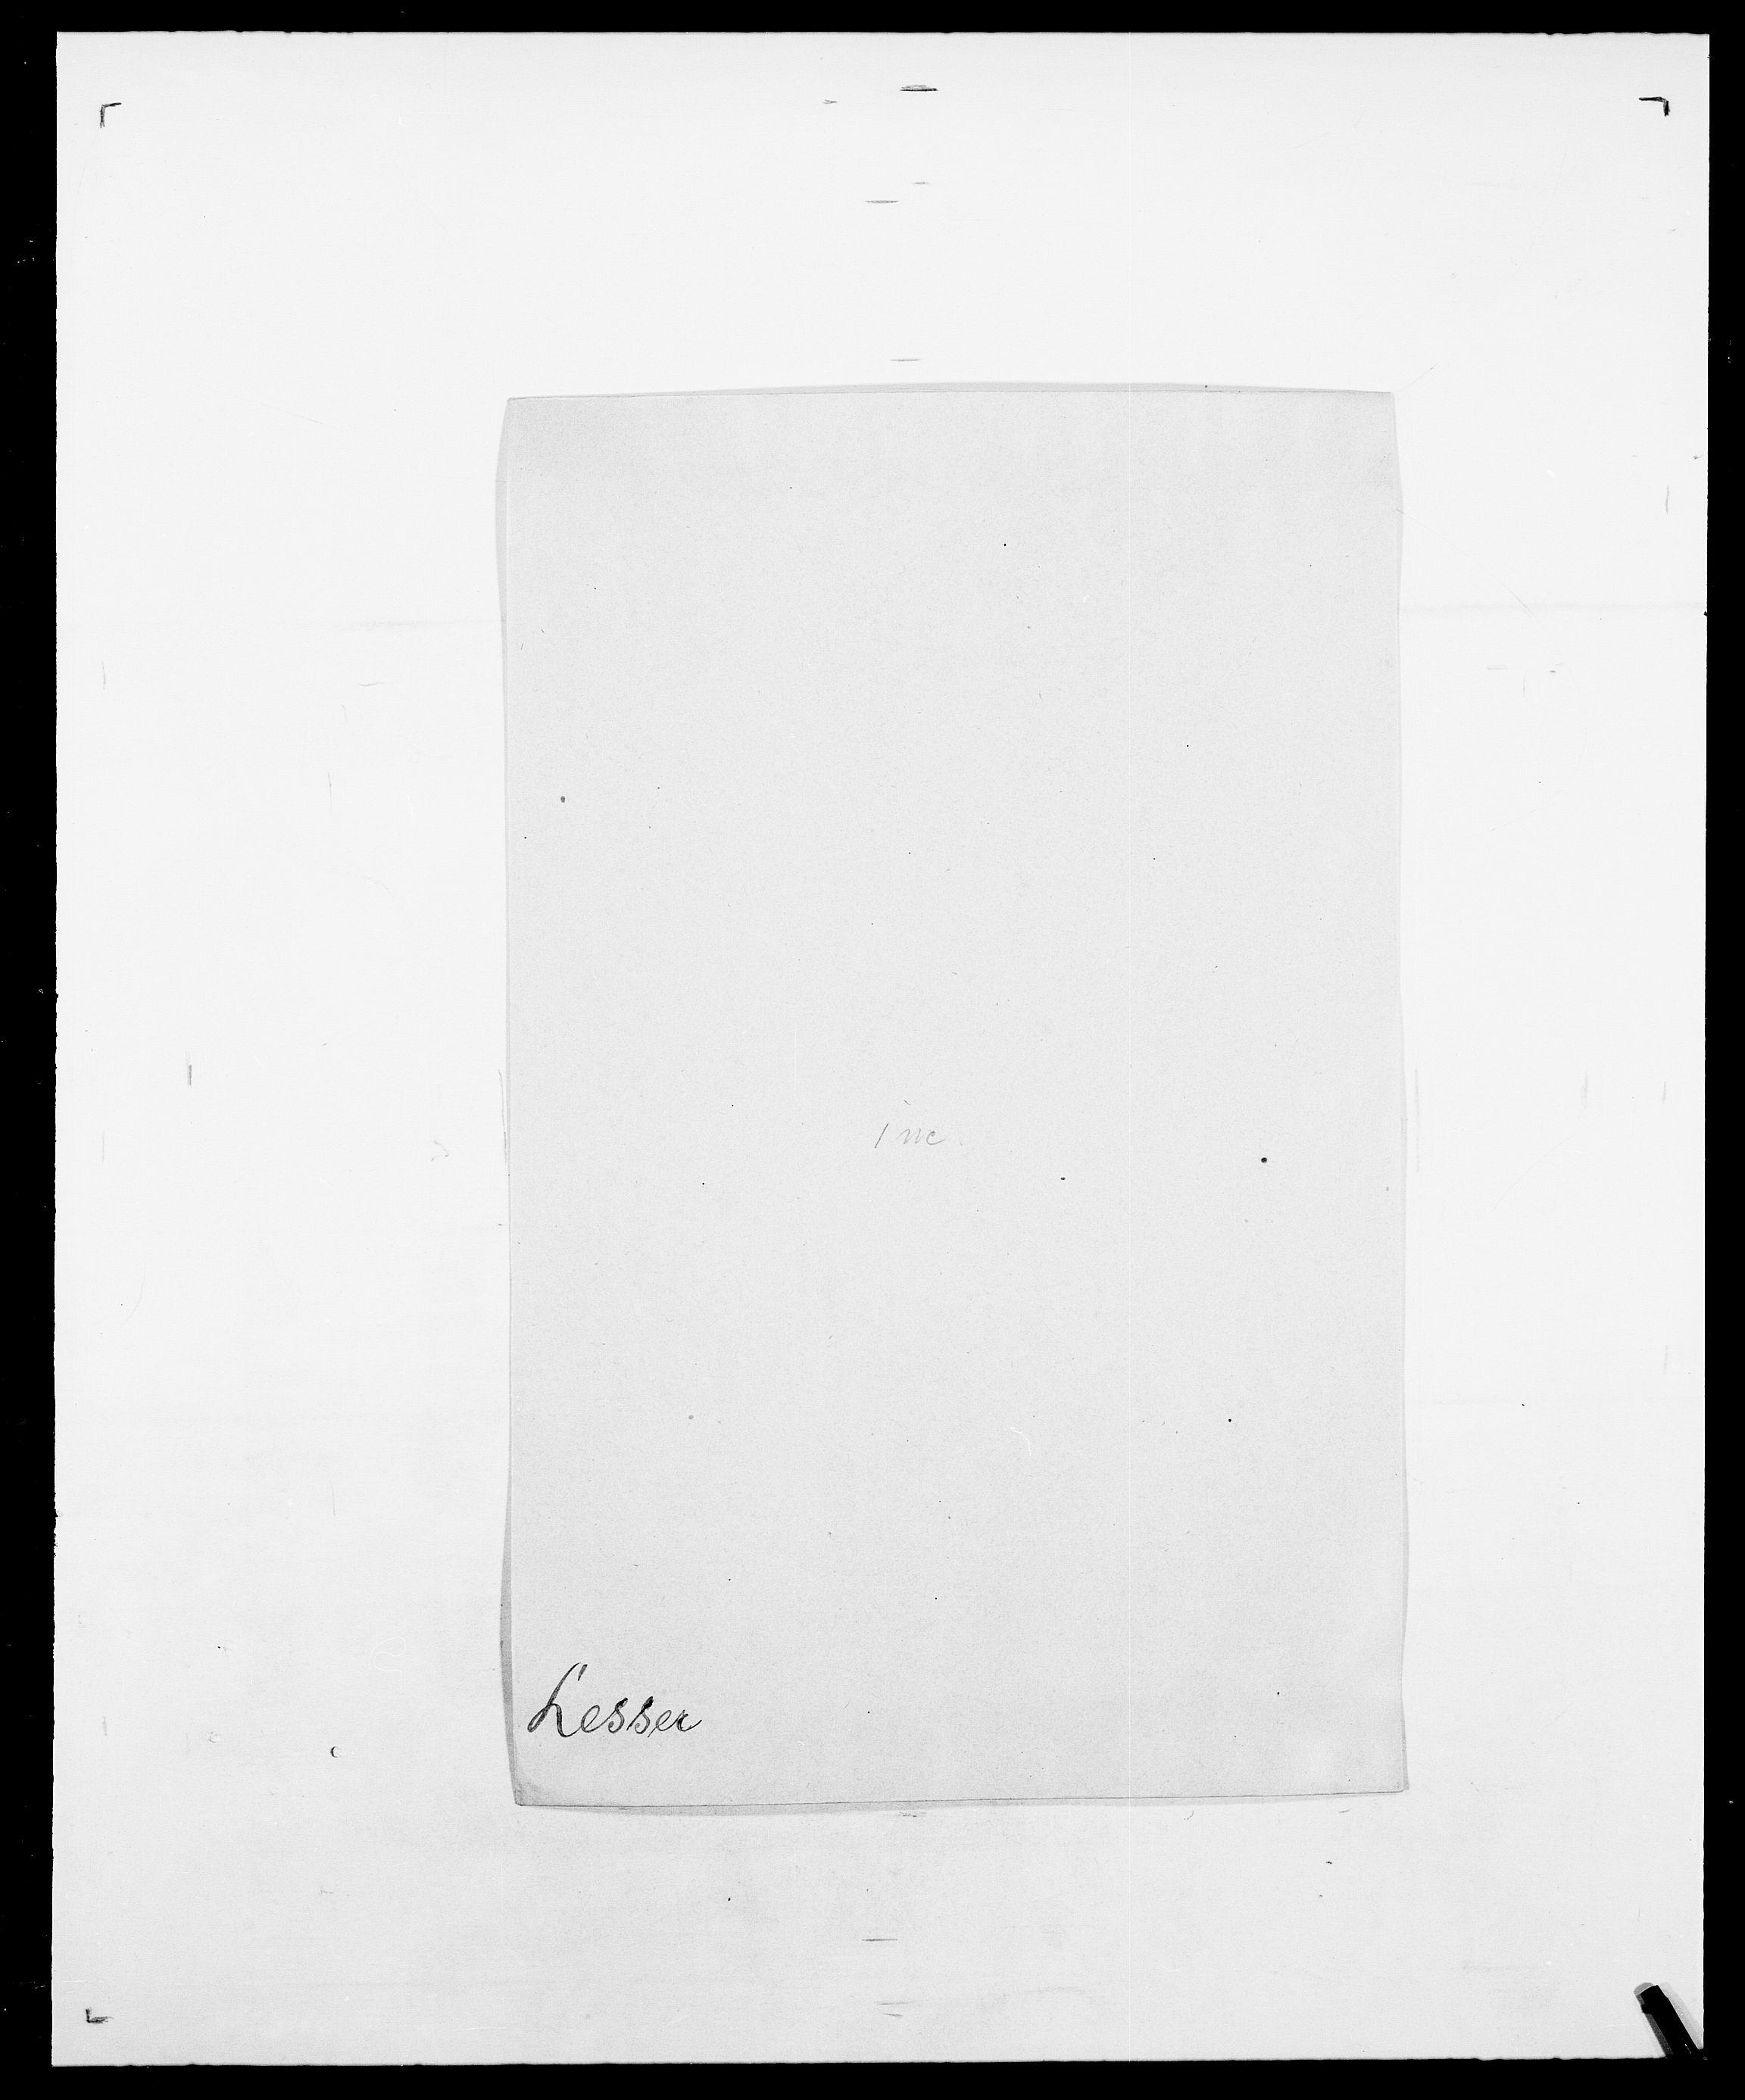 SAO, Delgobe, Charles Antoine - samling, D/Da/L0023: Lau - Lirvyn, s. 255